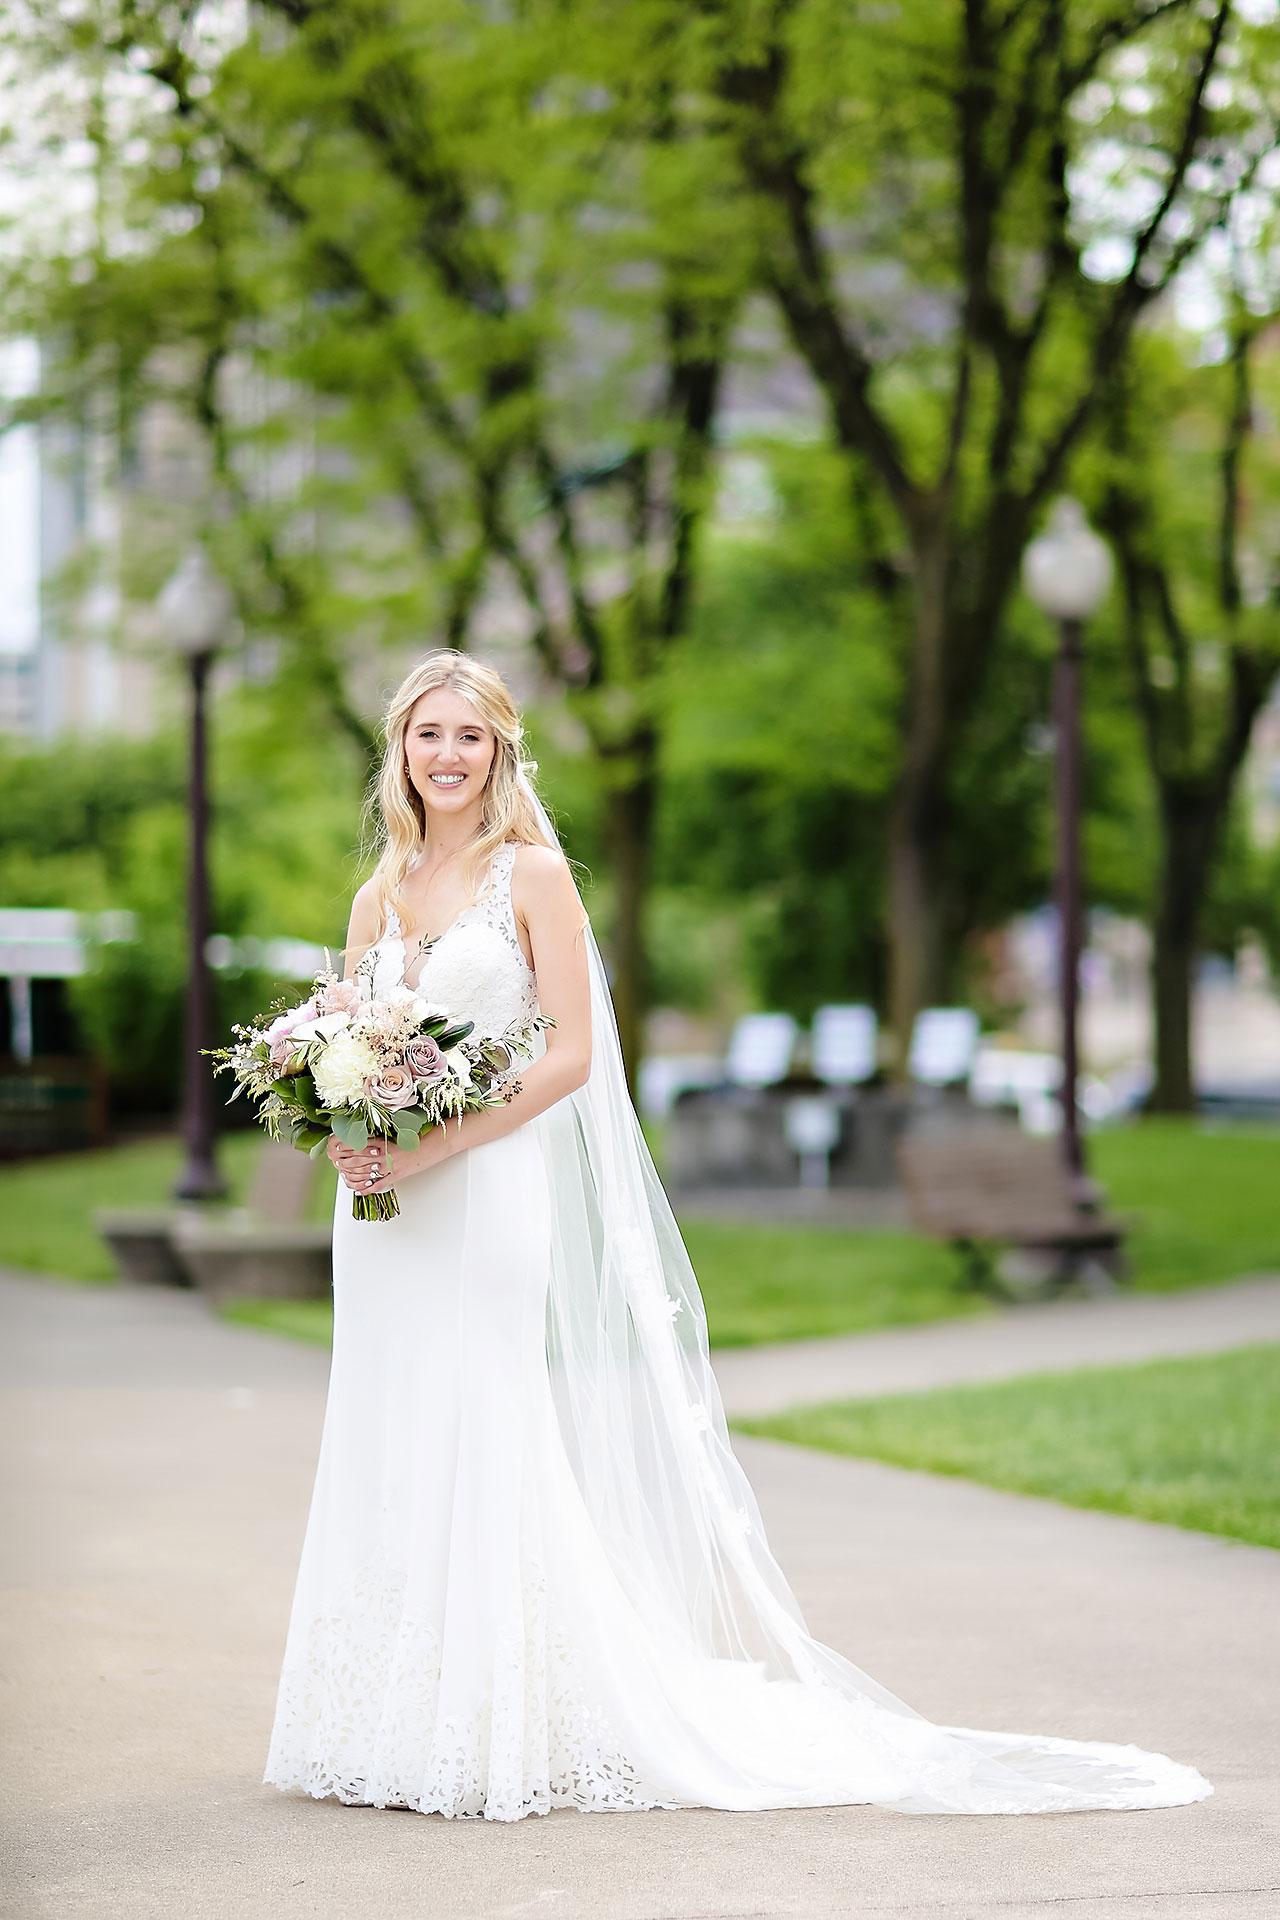 Allison Jeff Union Station Crowne Plaza Indianapolis wedding 173